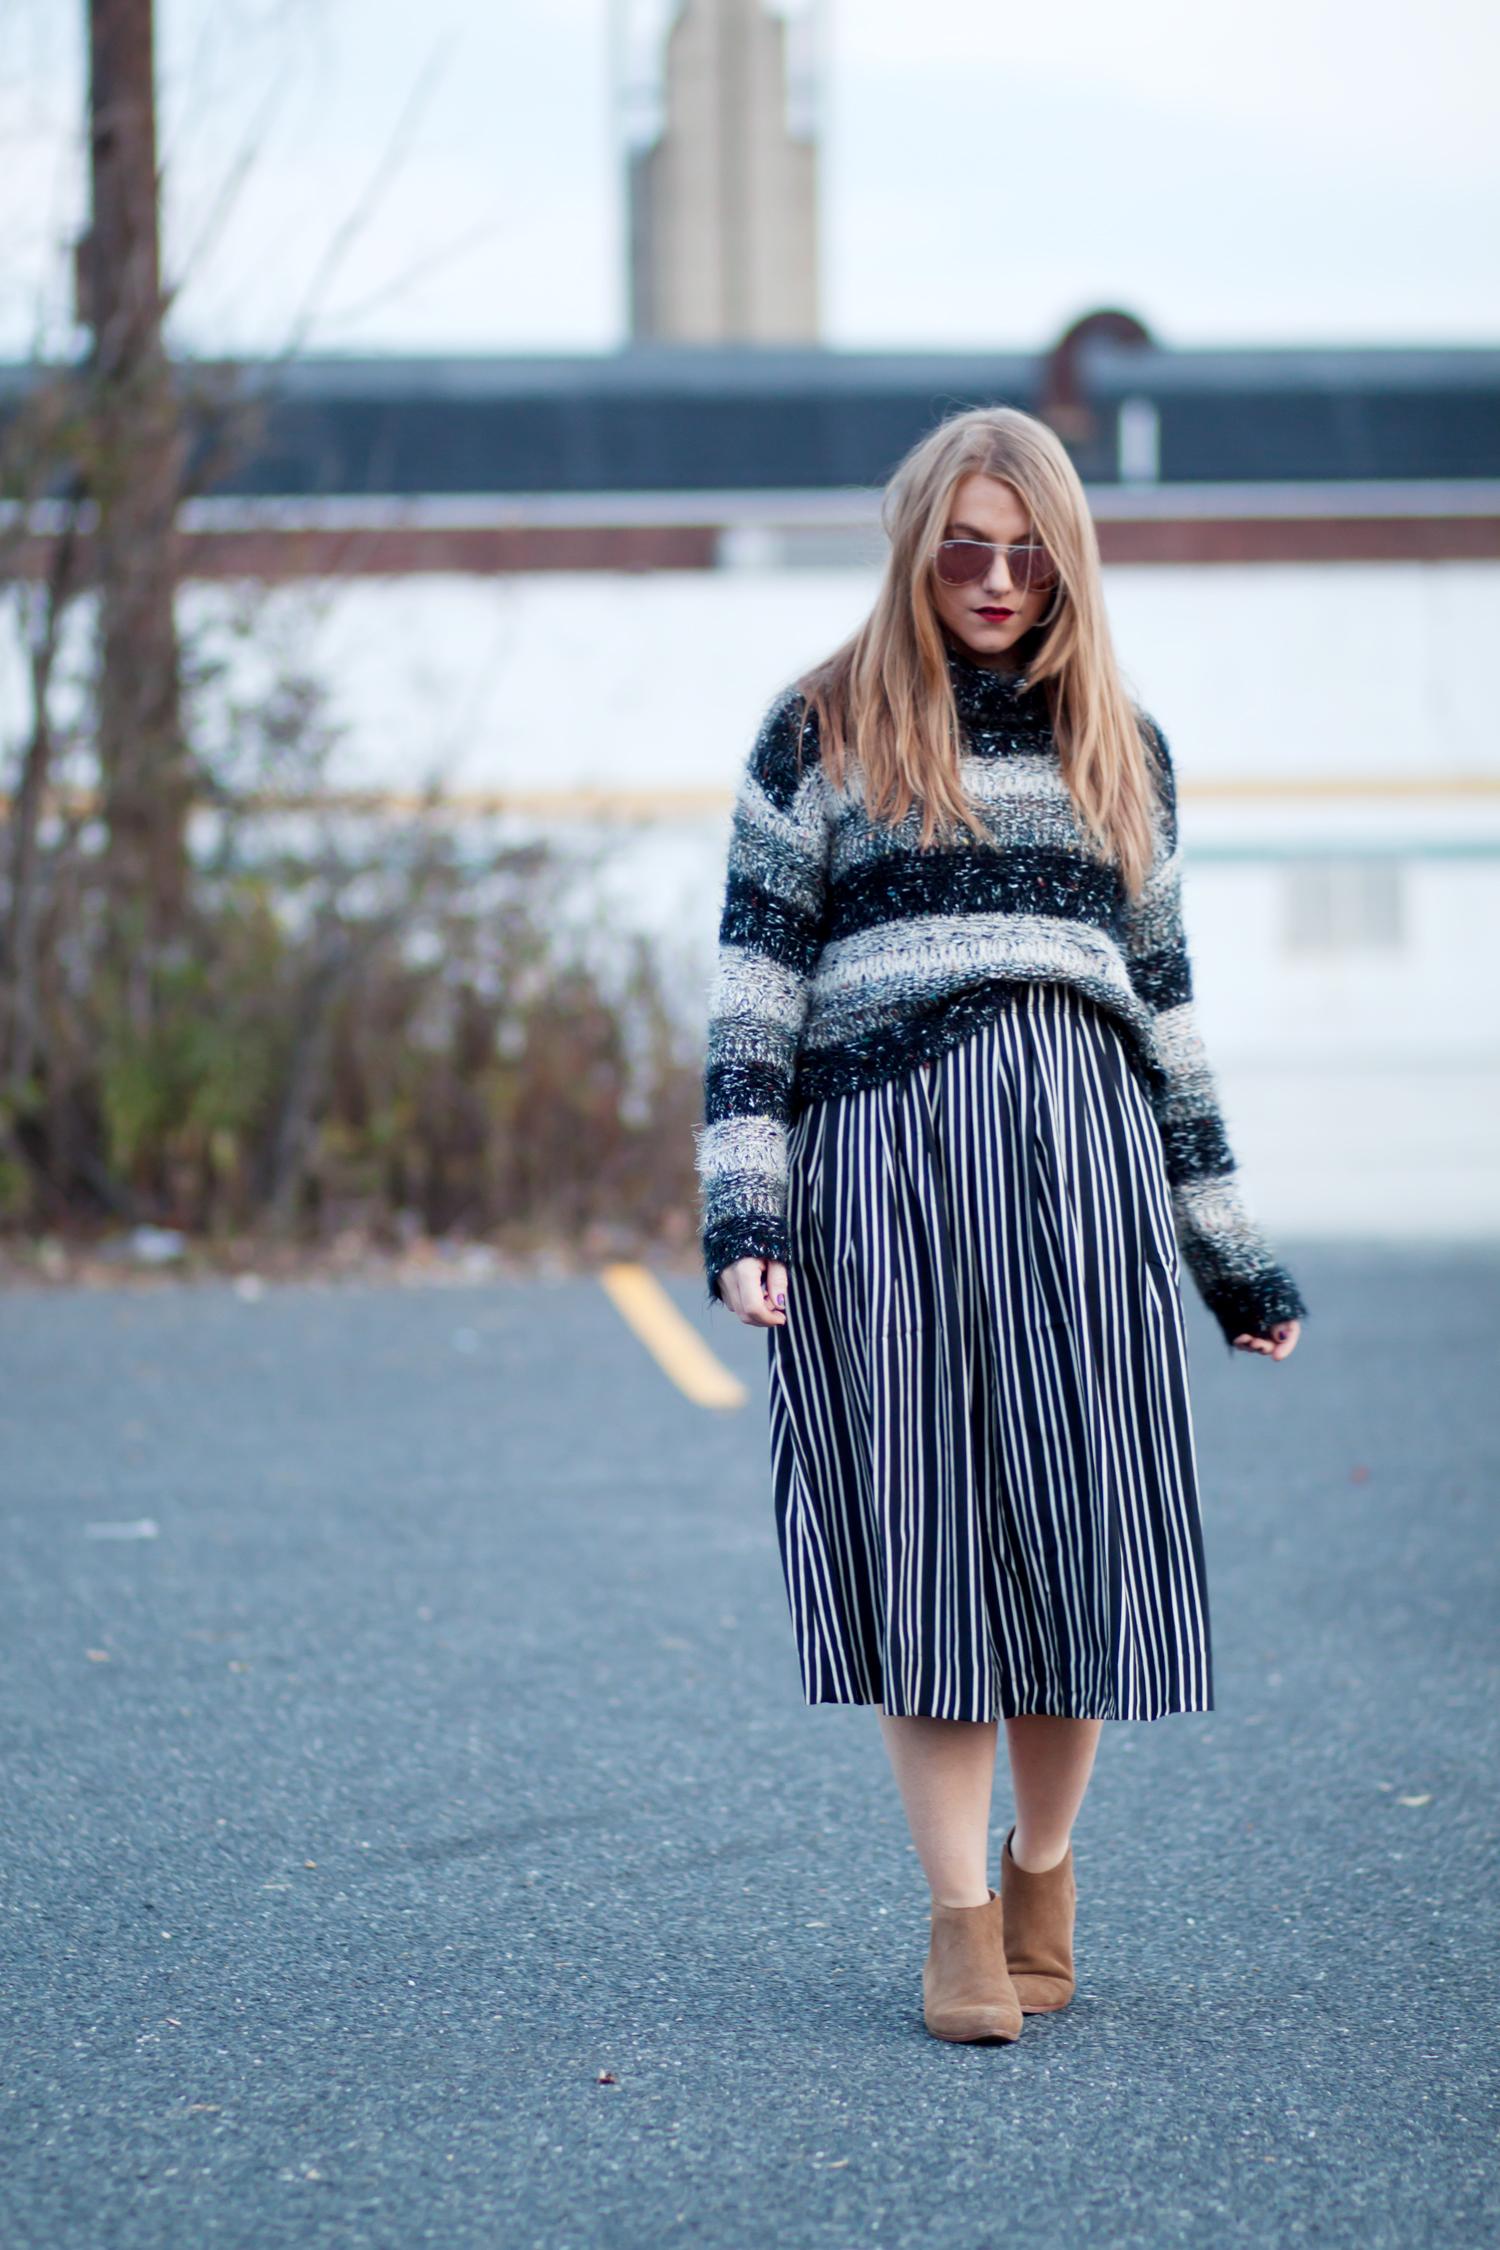 winterweater_1